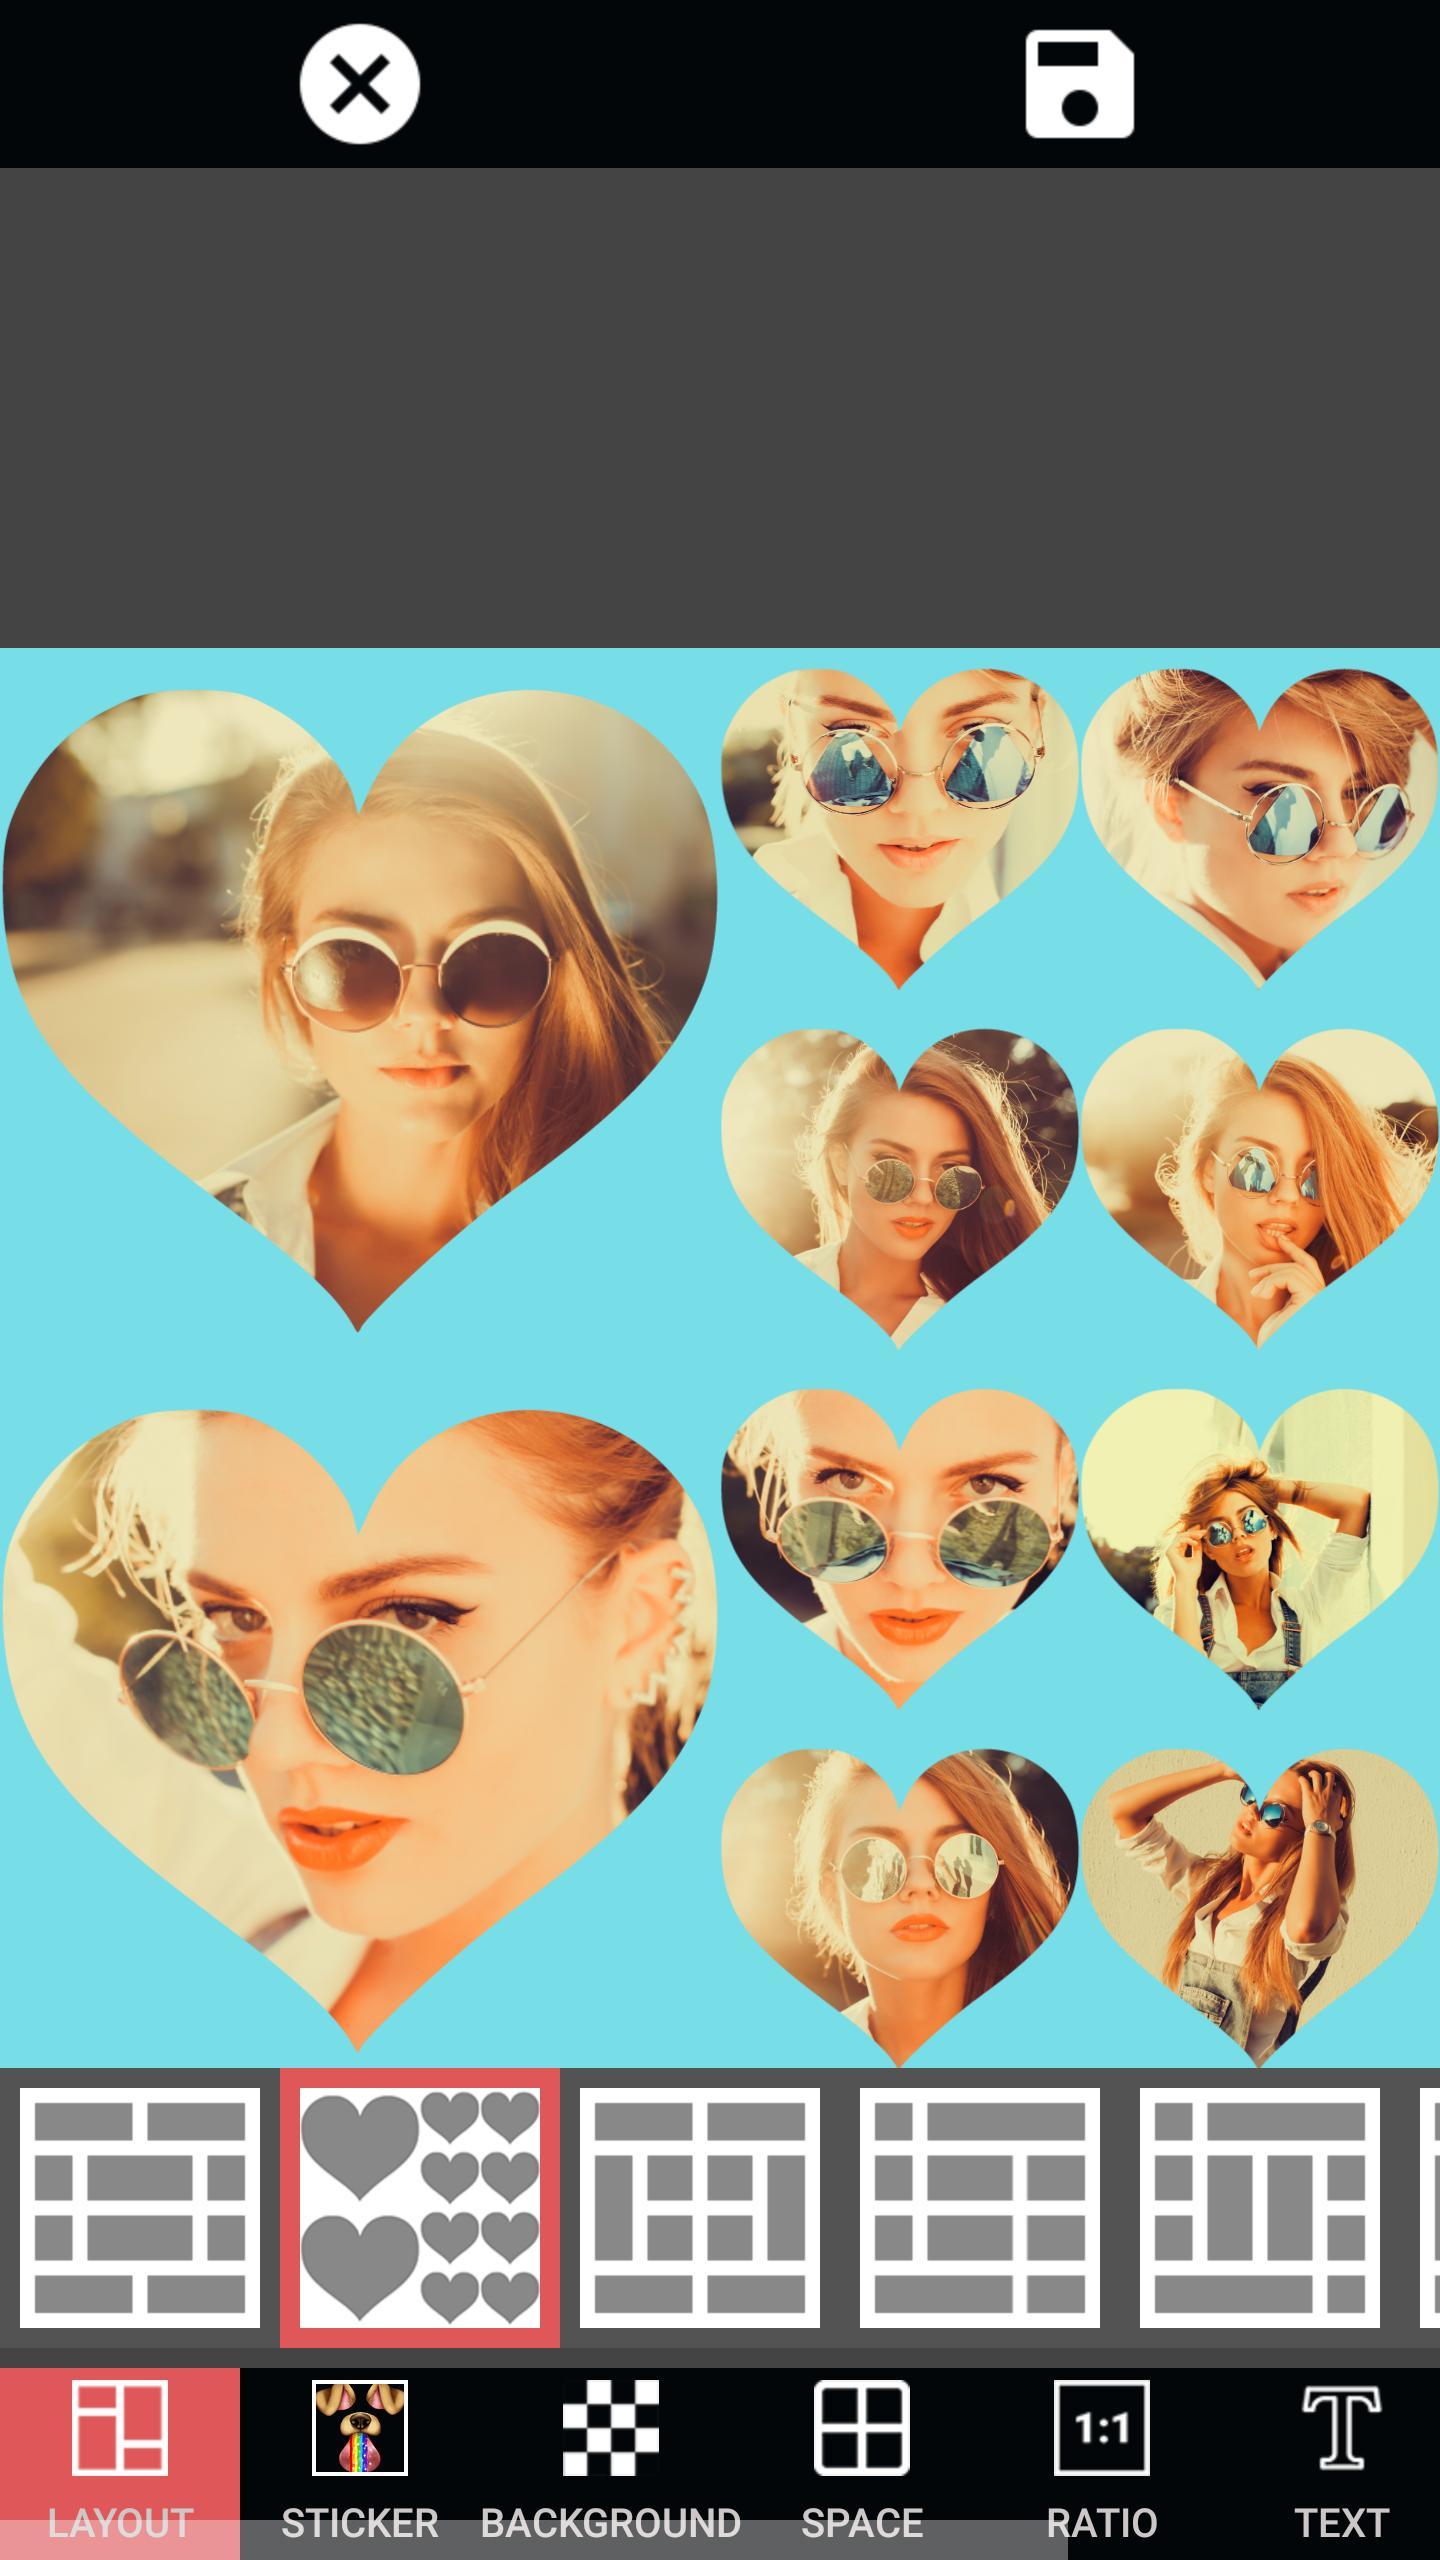 Selfie Camera Editor: Take Selfies & Edit Photos 2.2.2 Screenshot 19